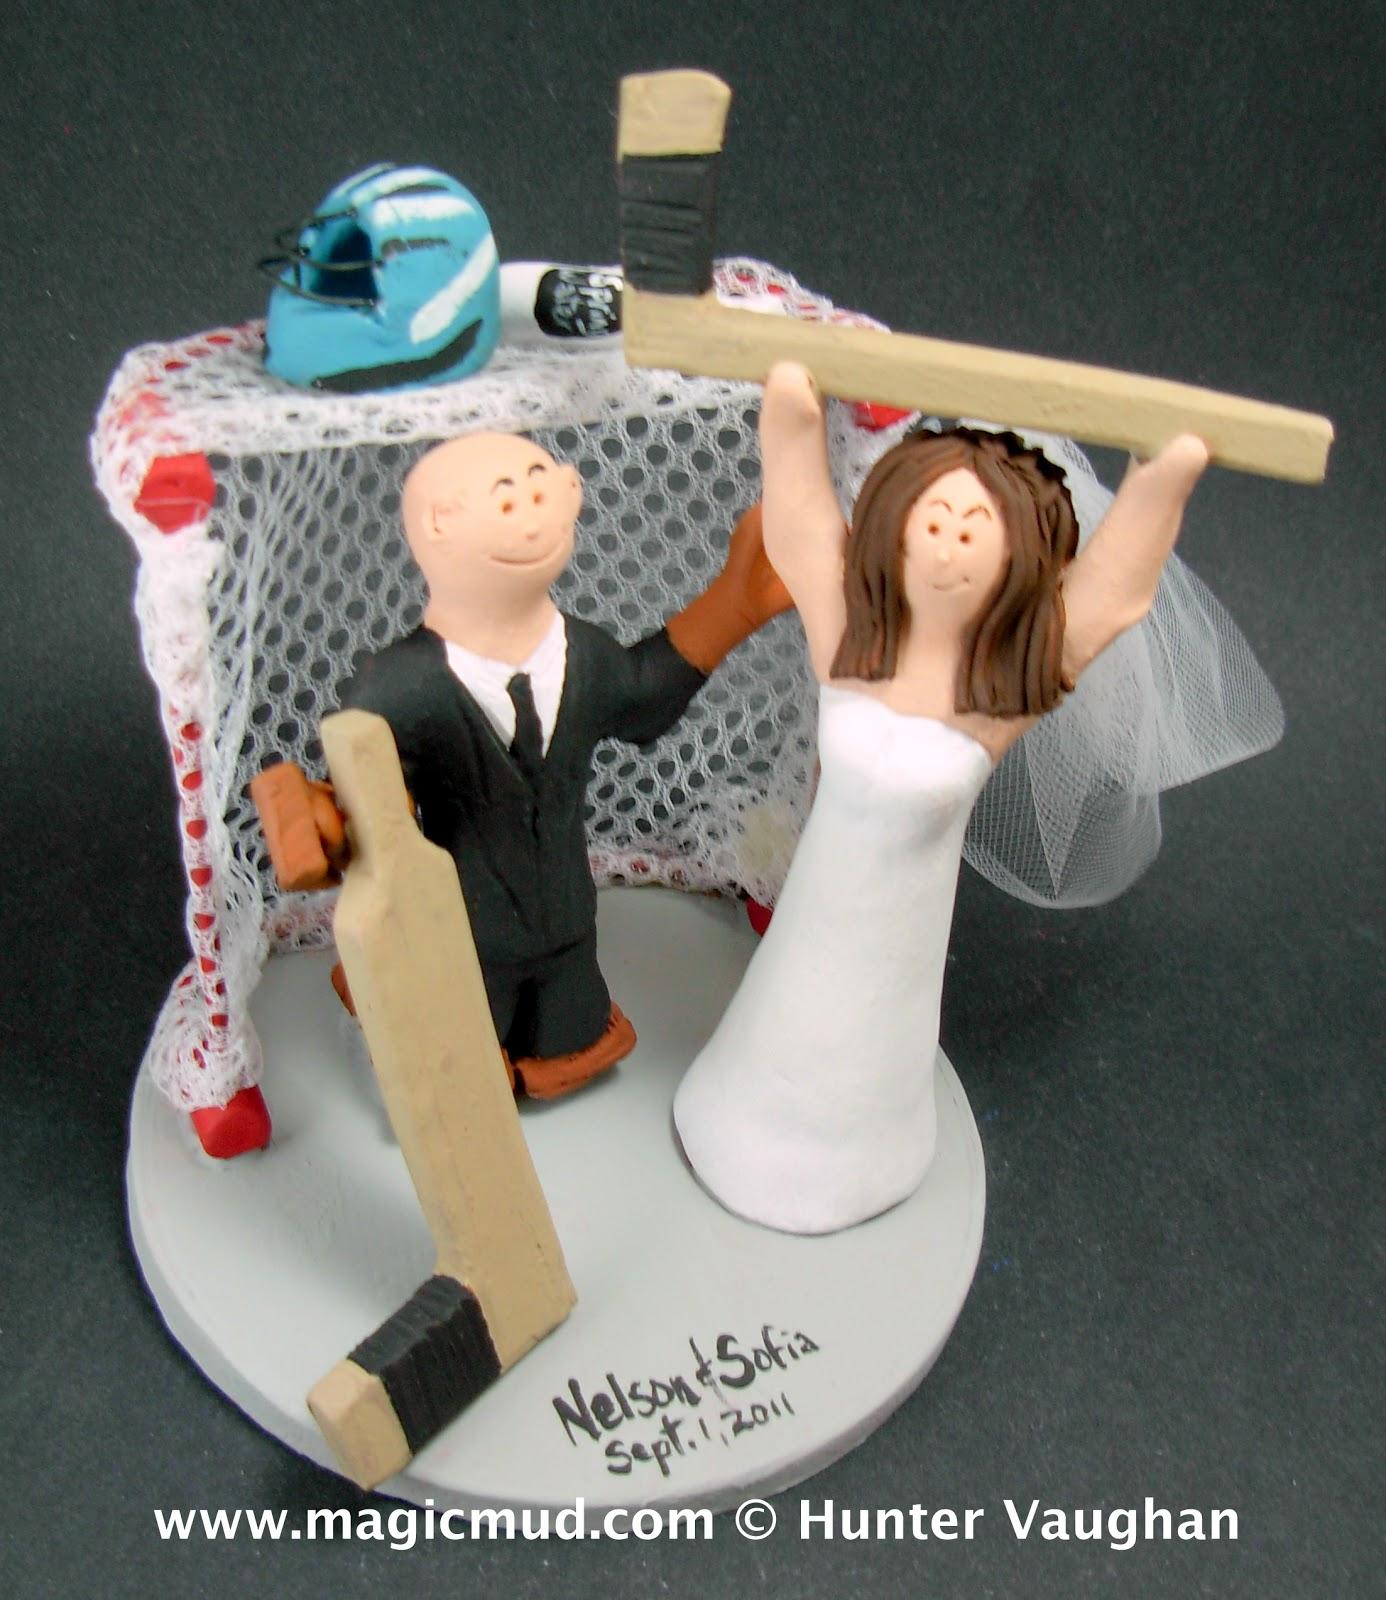 Nhl Hockey Wedding Cake Toppers